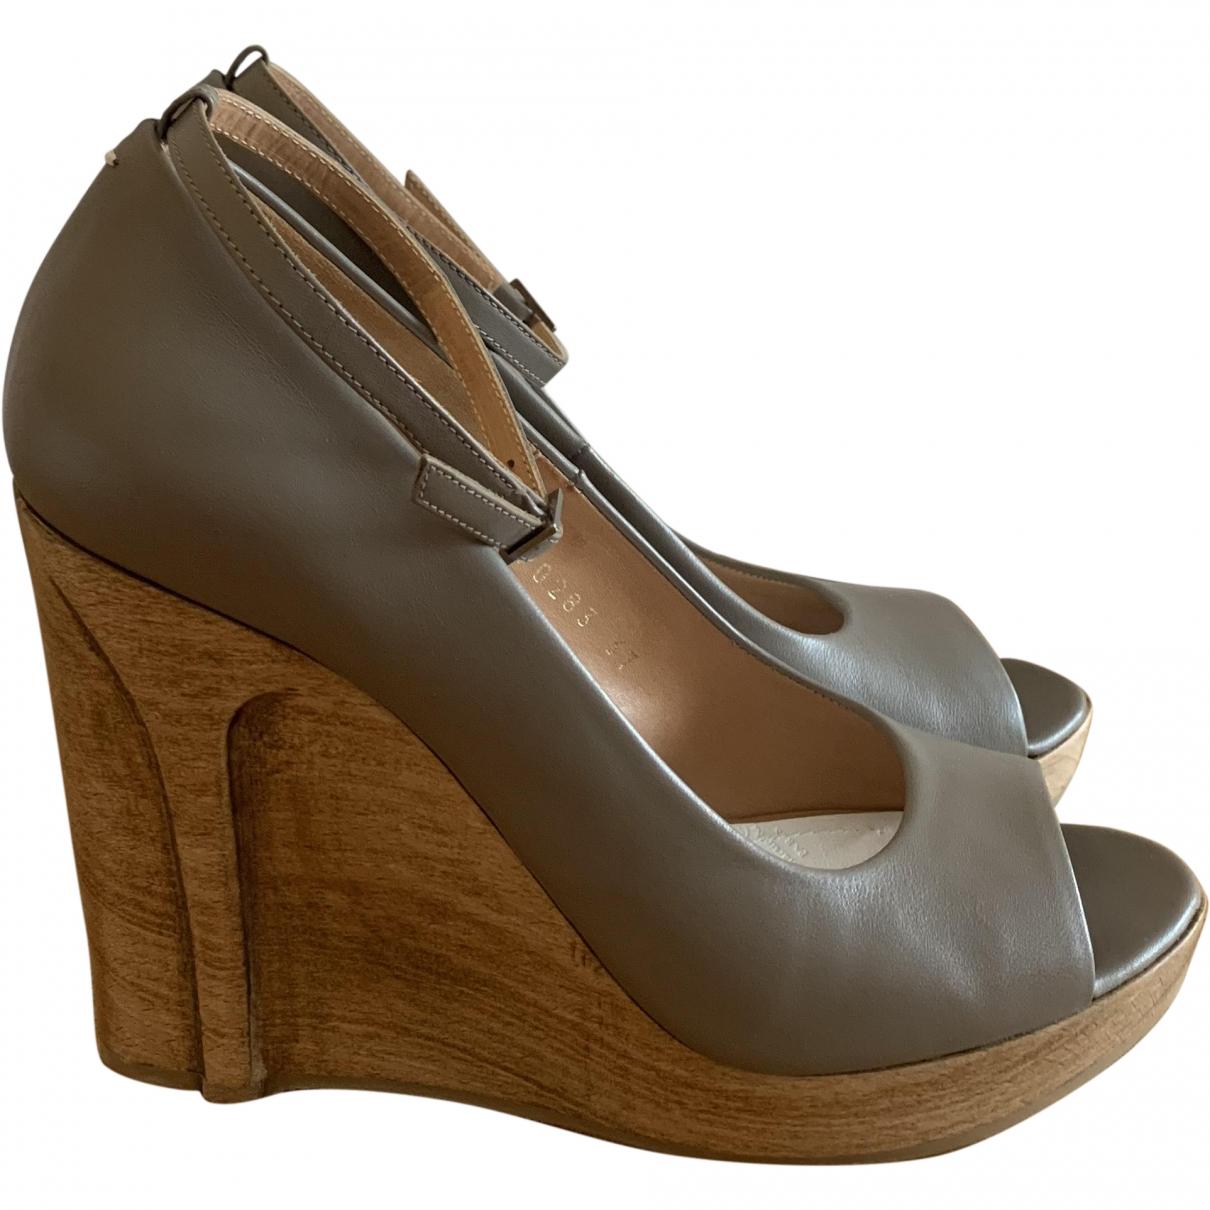 Maison Martin Margiela \N Grey Leather Heels for Women 37 EU